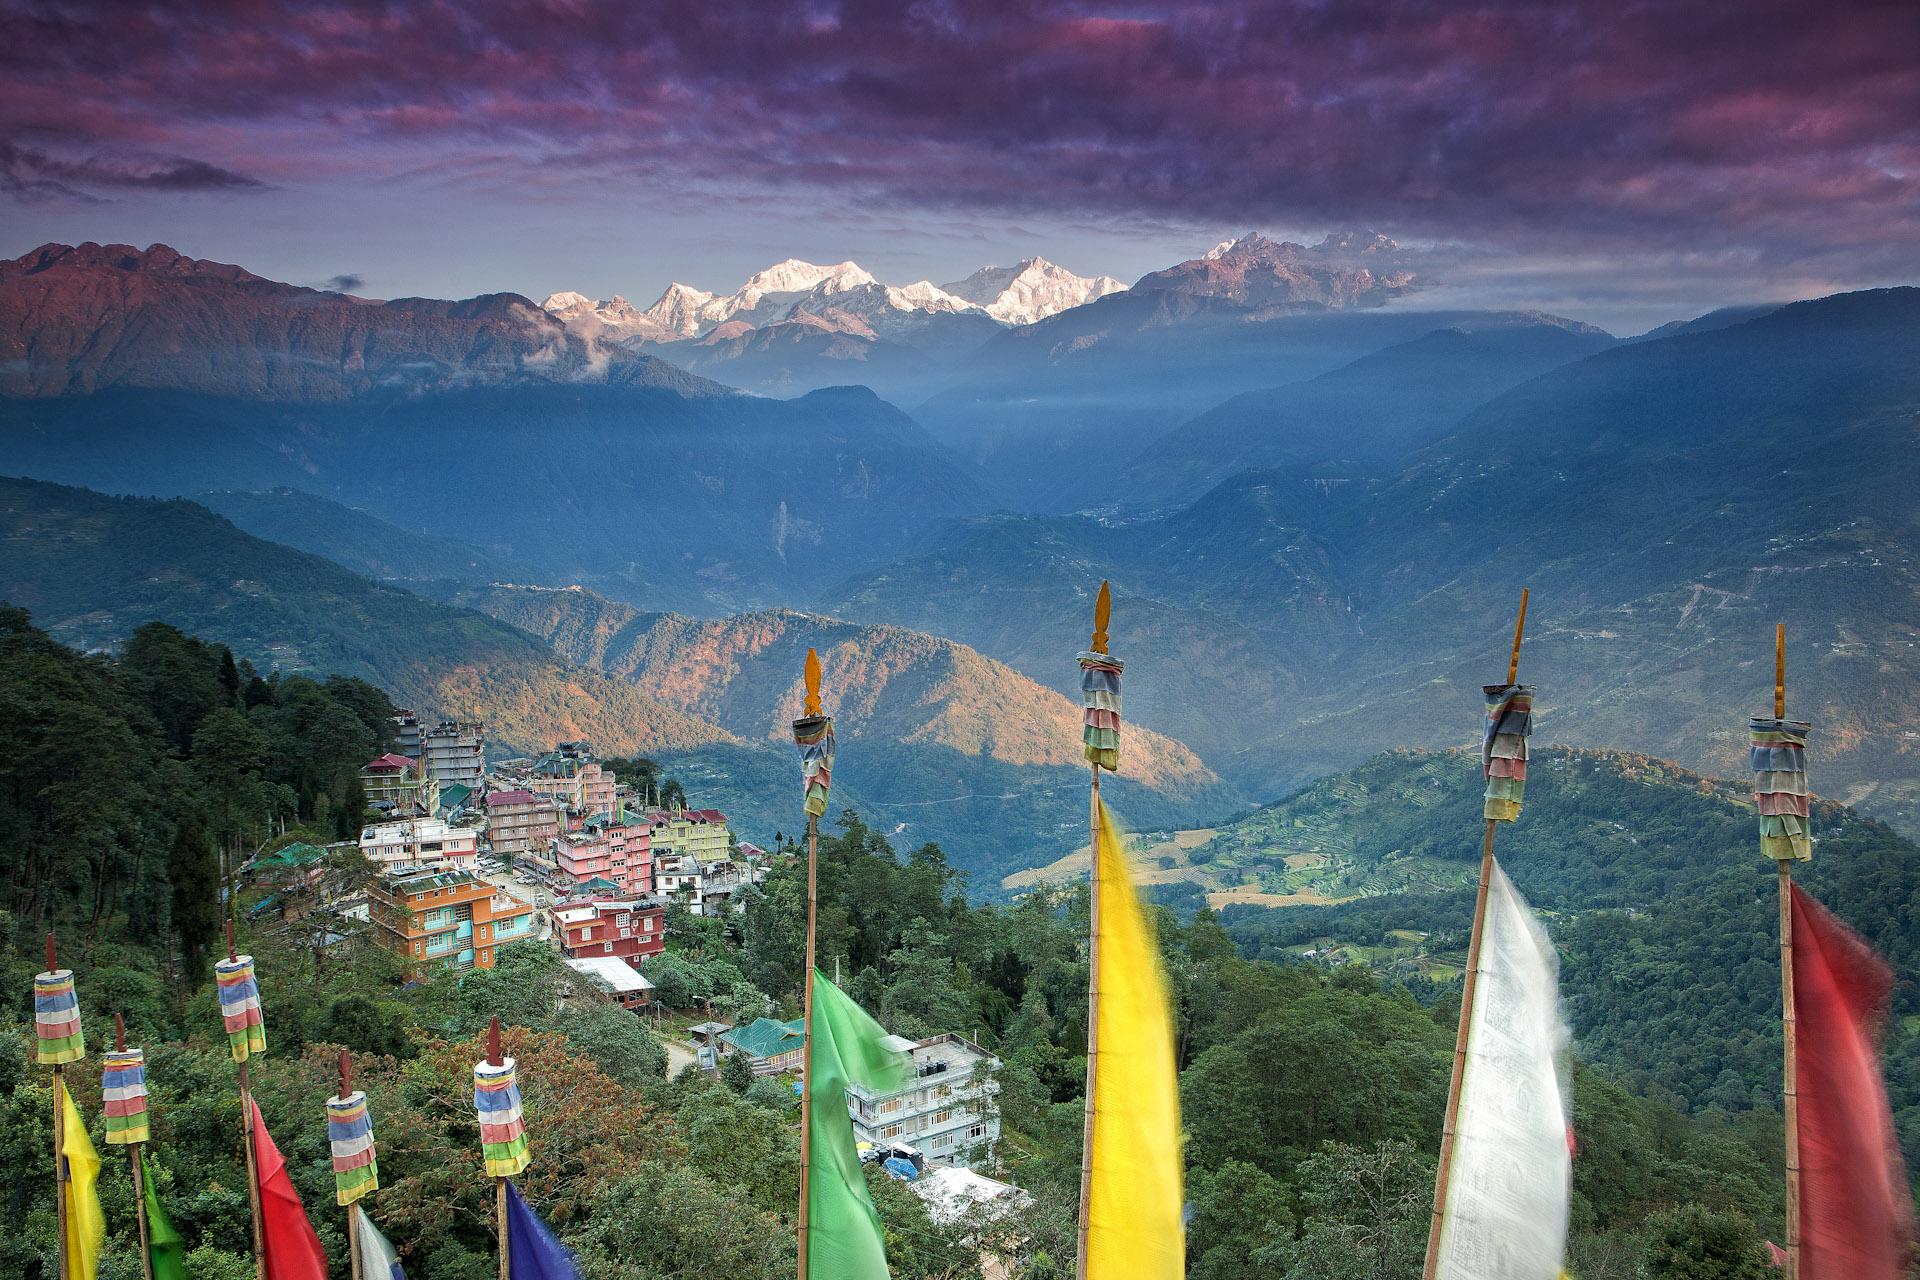 India-Sikkim-Travel-Pelling-Kanchenjunga-Jason-Bax.JPG